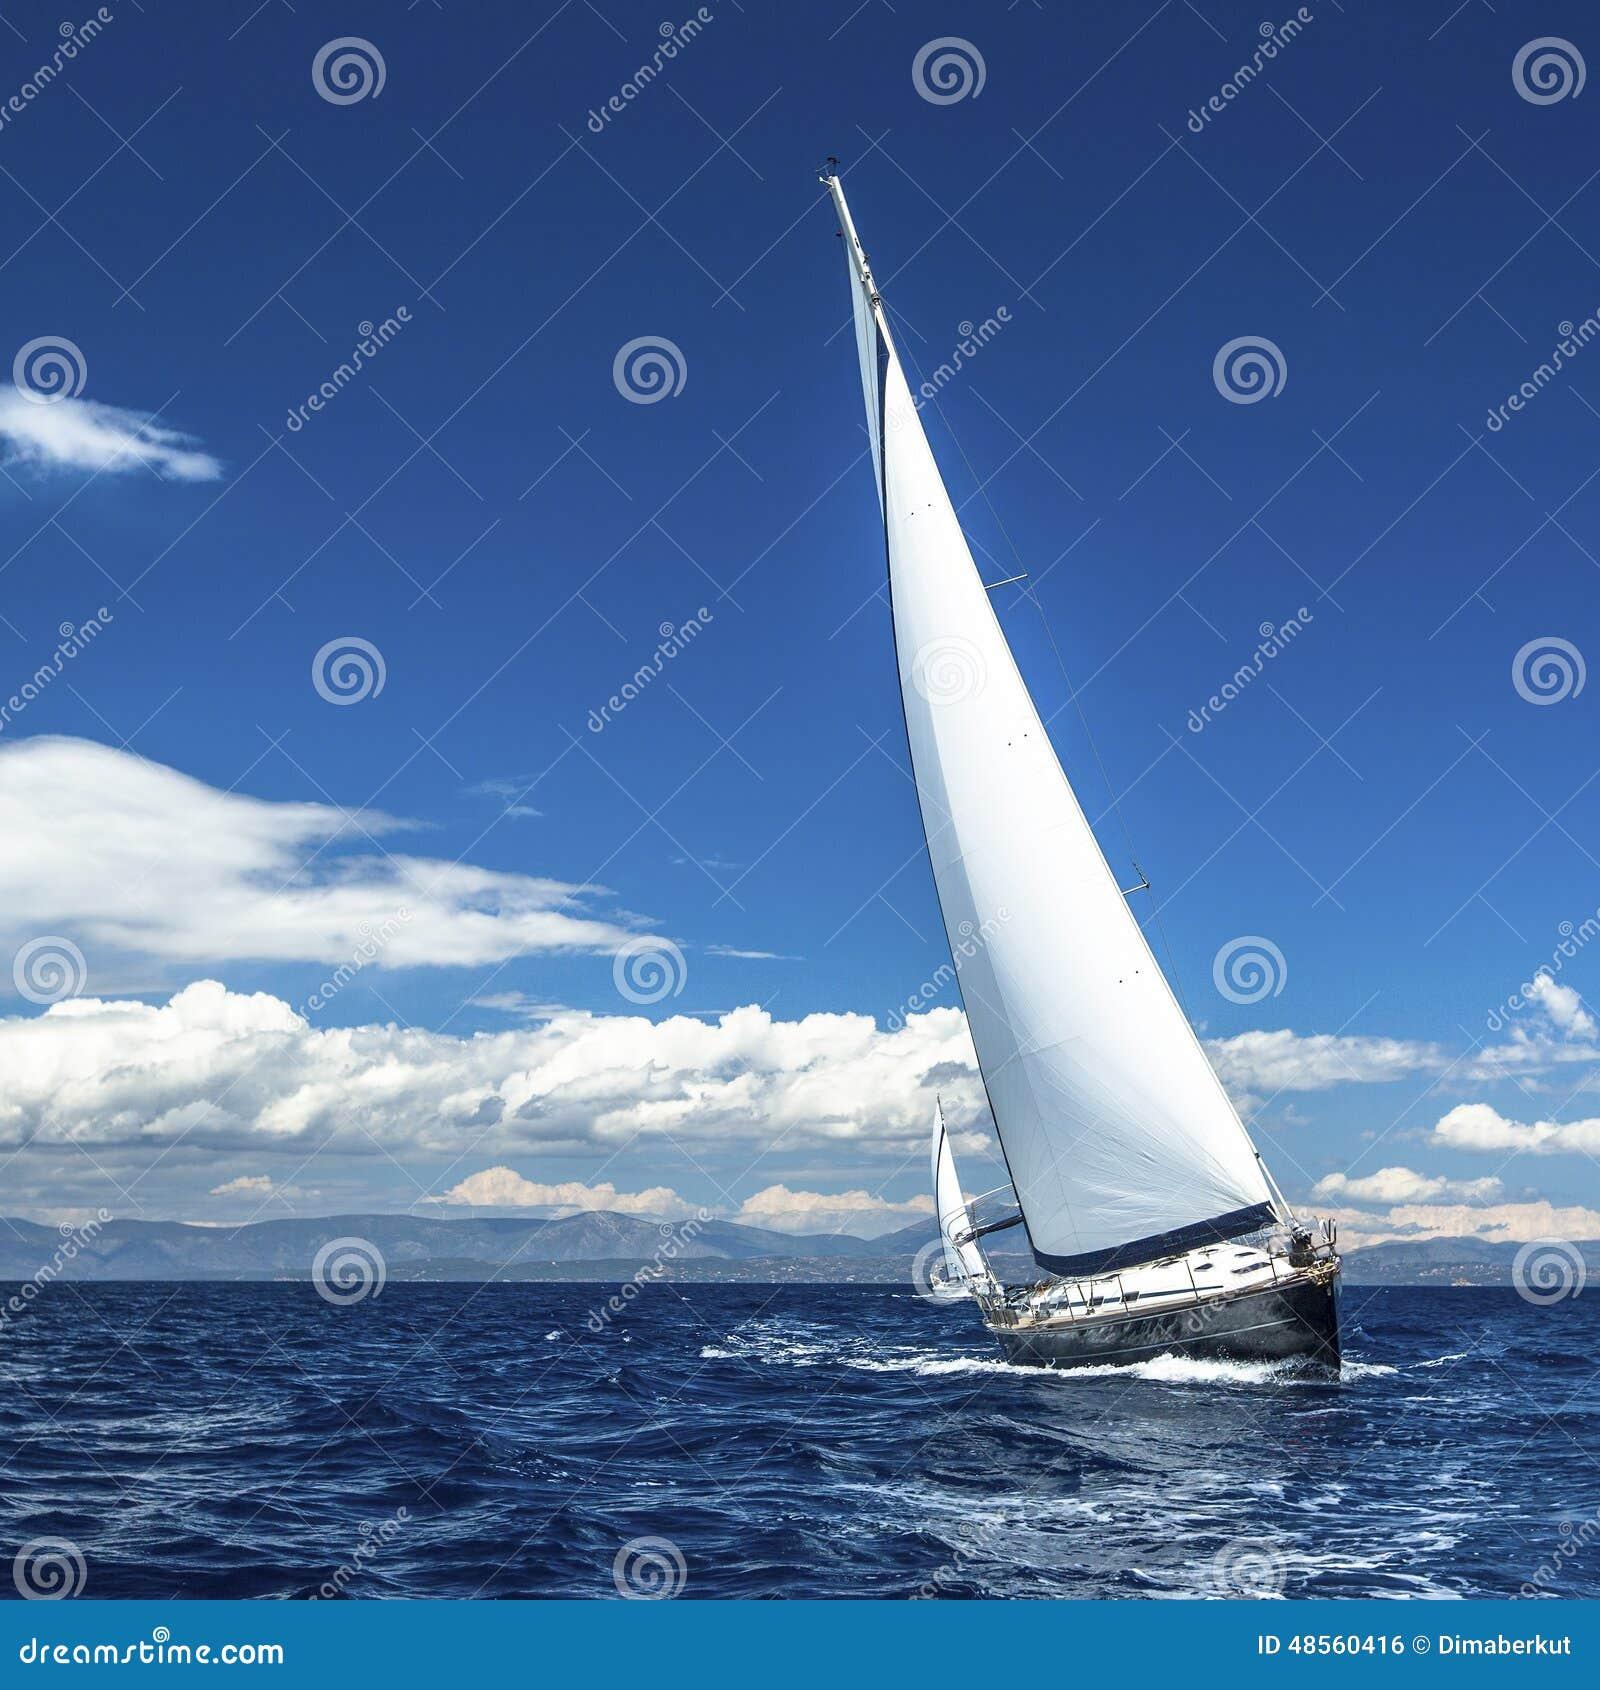 Jachtzeilen met mooie wolkenloze hemel sailing